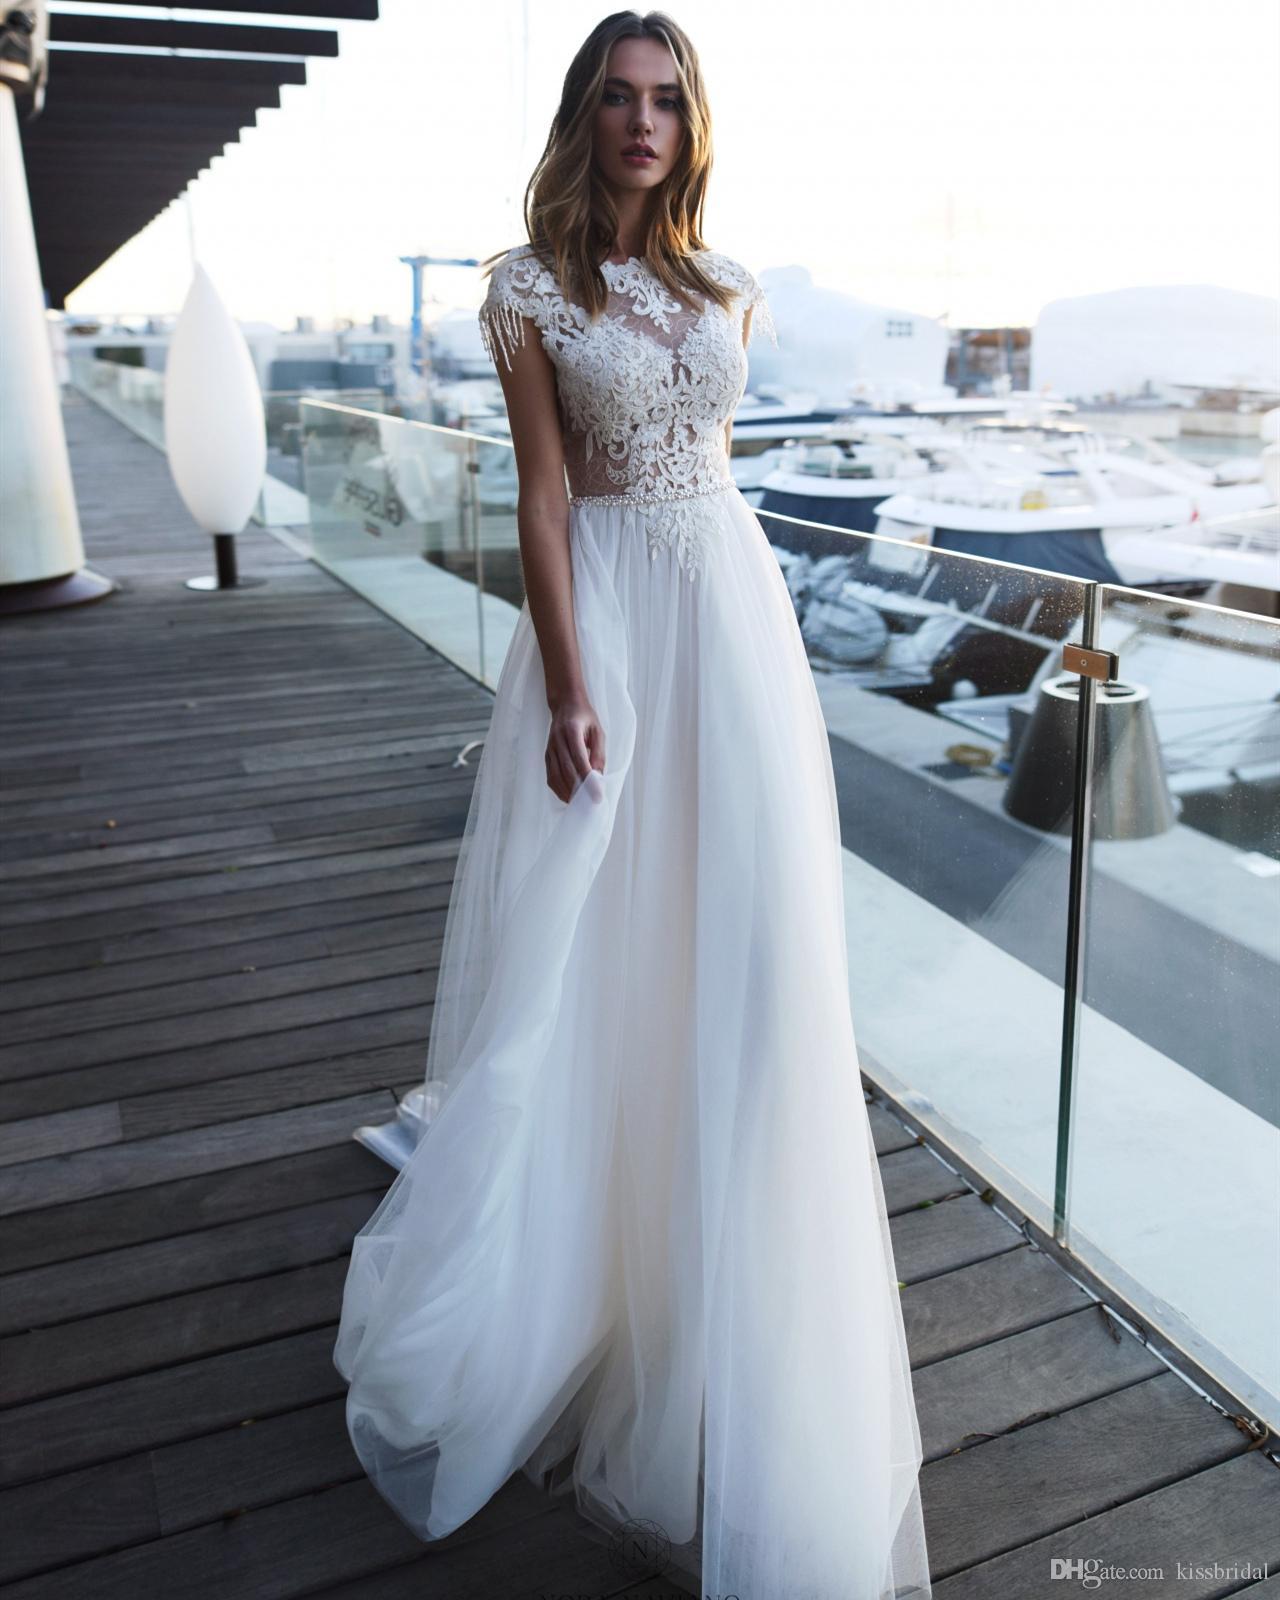 JNew Design Boho Wedding Dress 2020 Bateau Neck Sleeveless A-Line Court Train Beading Appliques Tulle Bride Gowns Vestidos de novia Robe